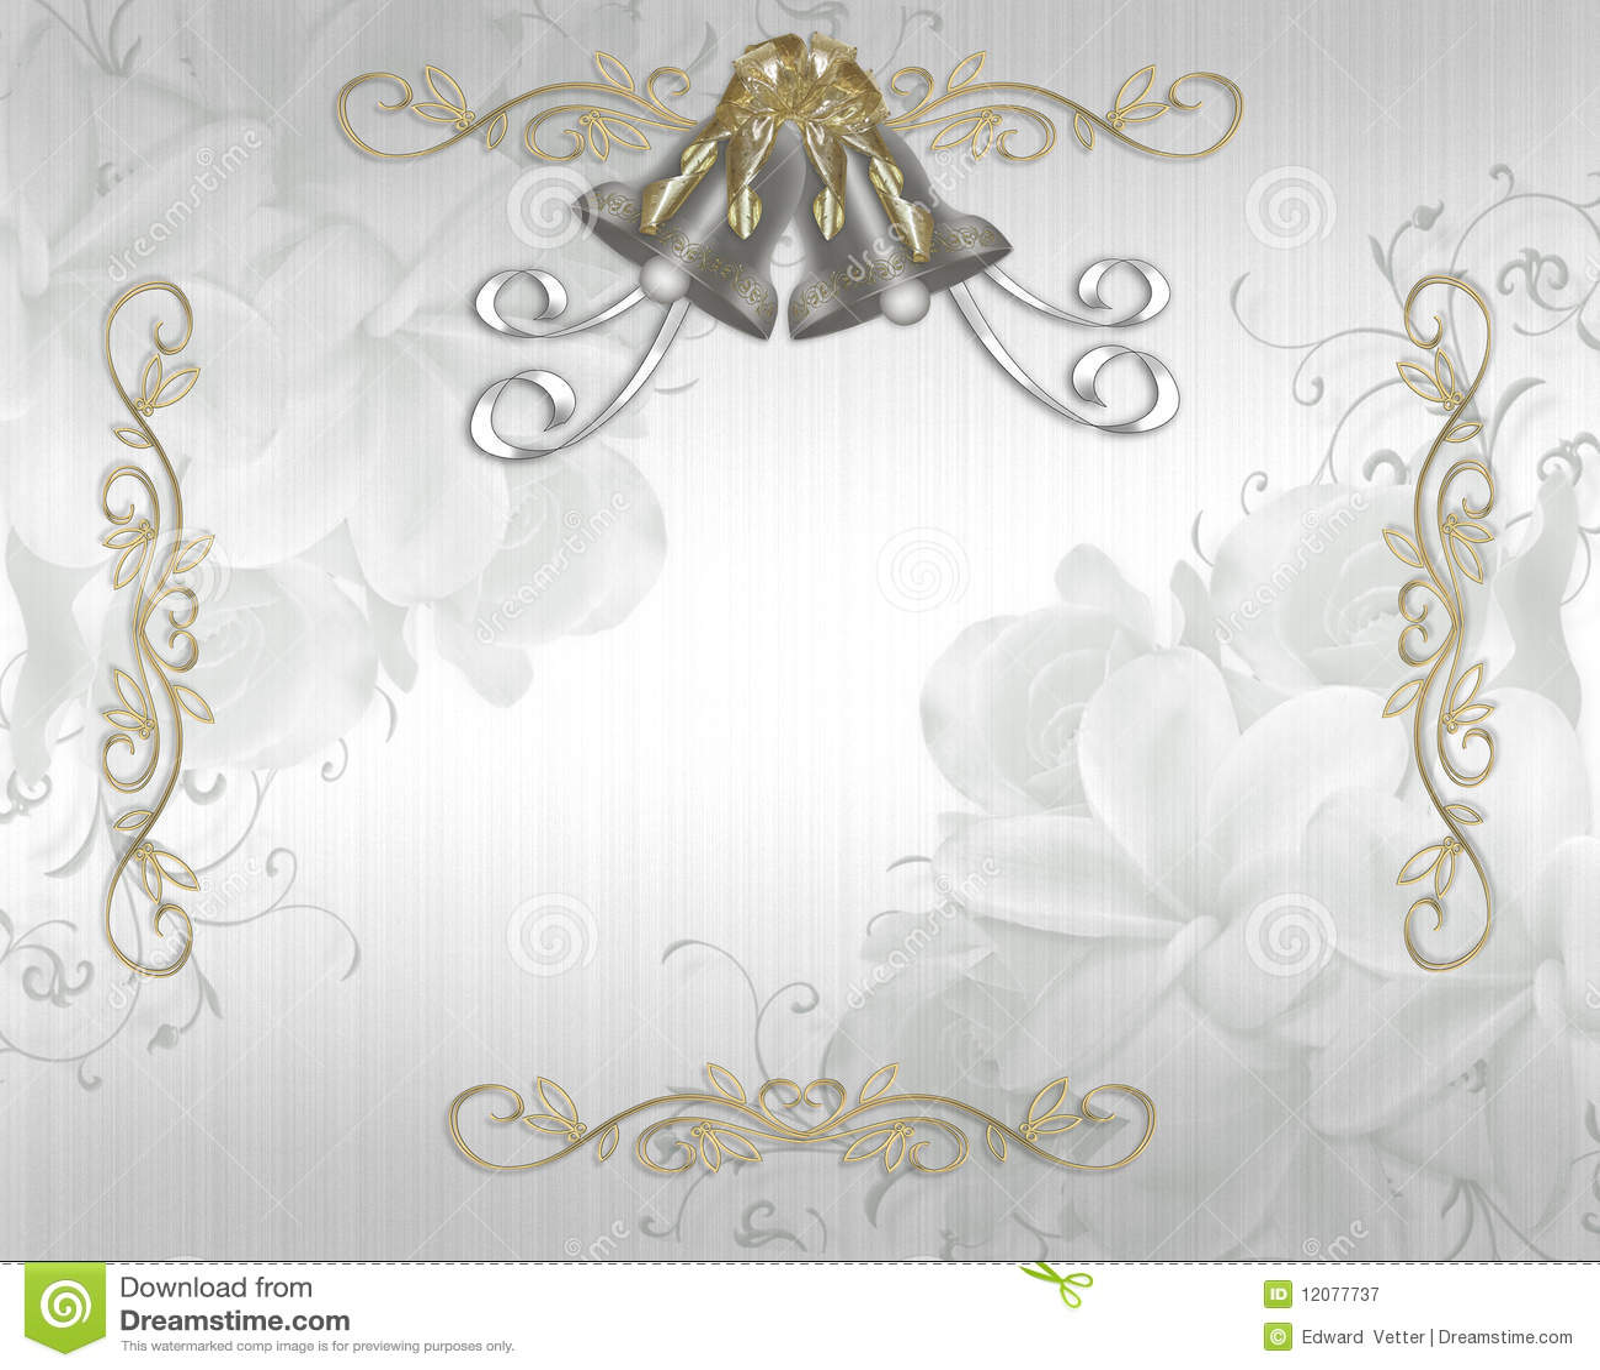 Wedding Bell Flowers